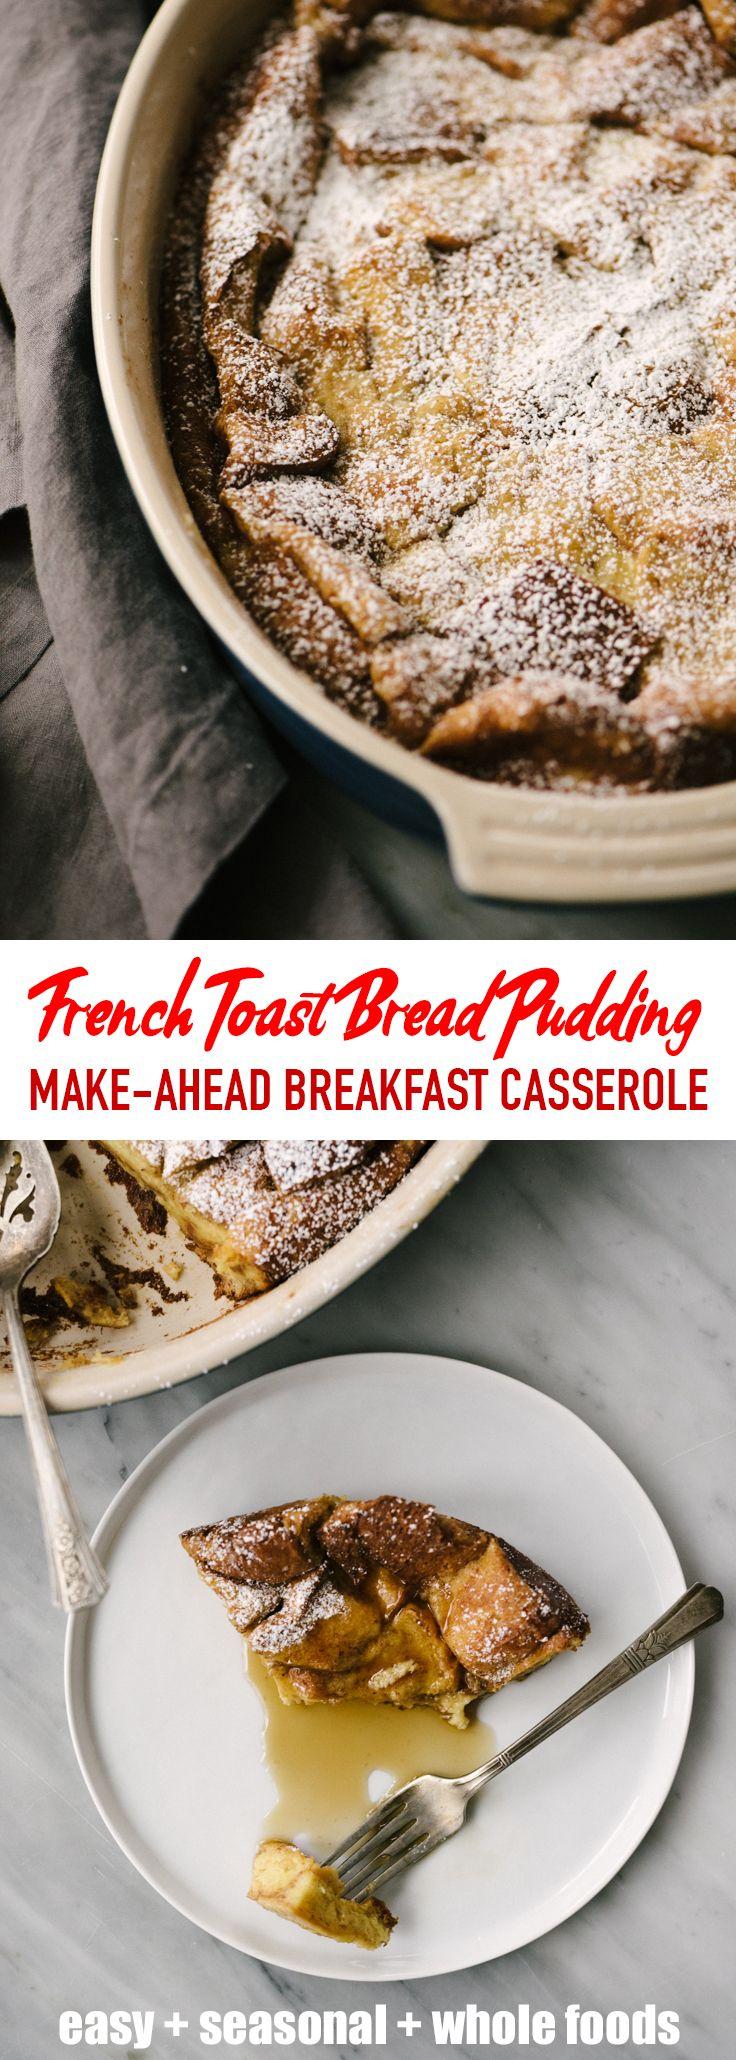 French Toast Bread Pudding | Recipe | Breakfast casserole ...